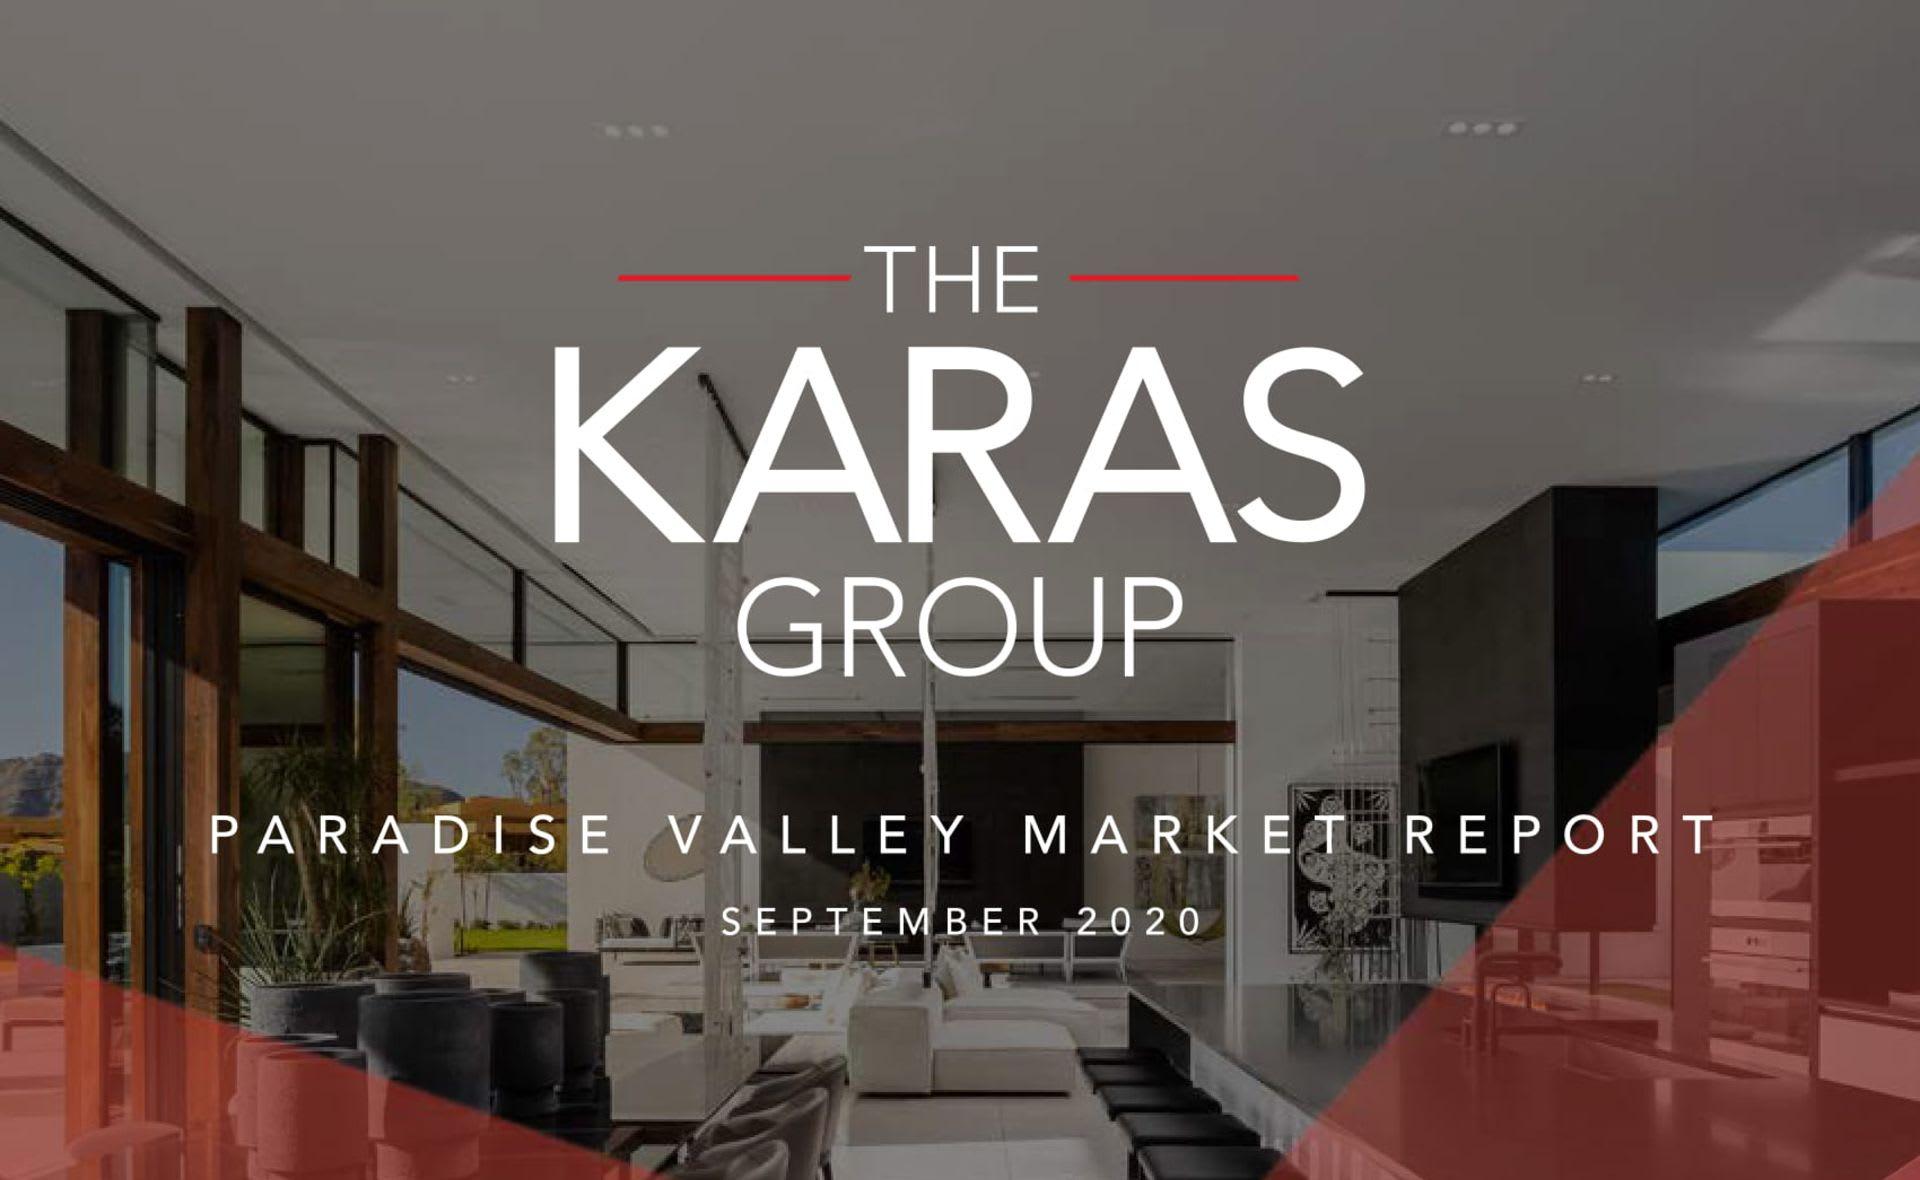 The Karas Group Paradise Valley Market Report (September 2020)